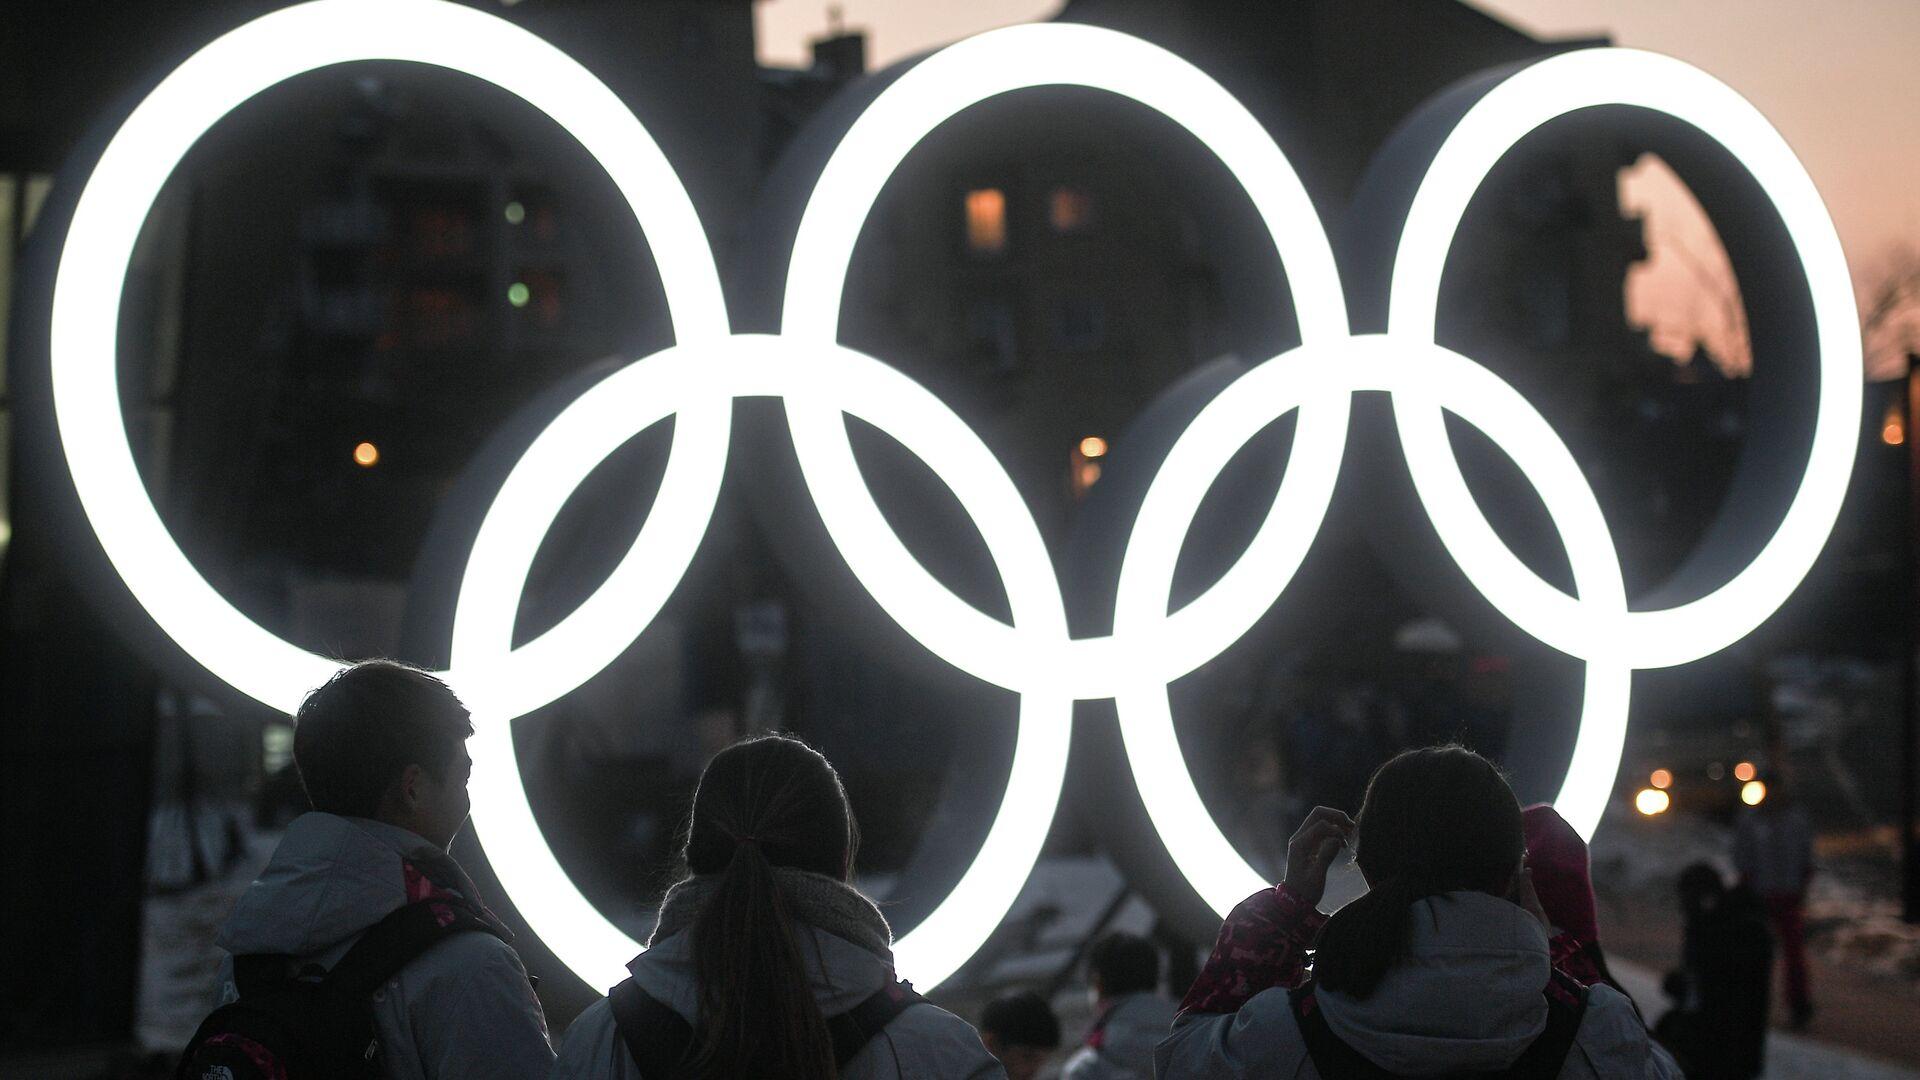 Олимпийские кольца - РИА Новости, 1920, 14.07.2021